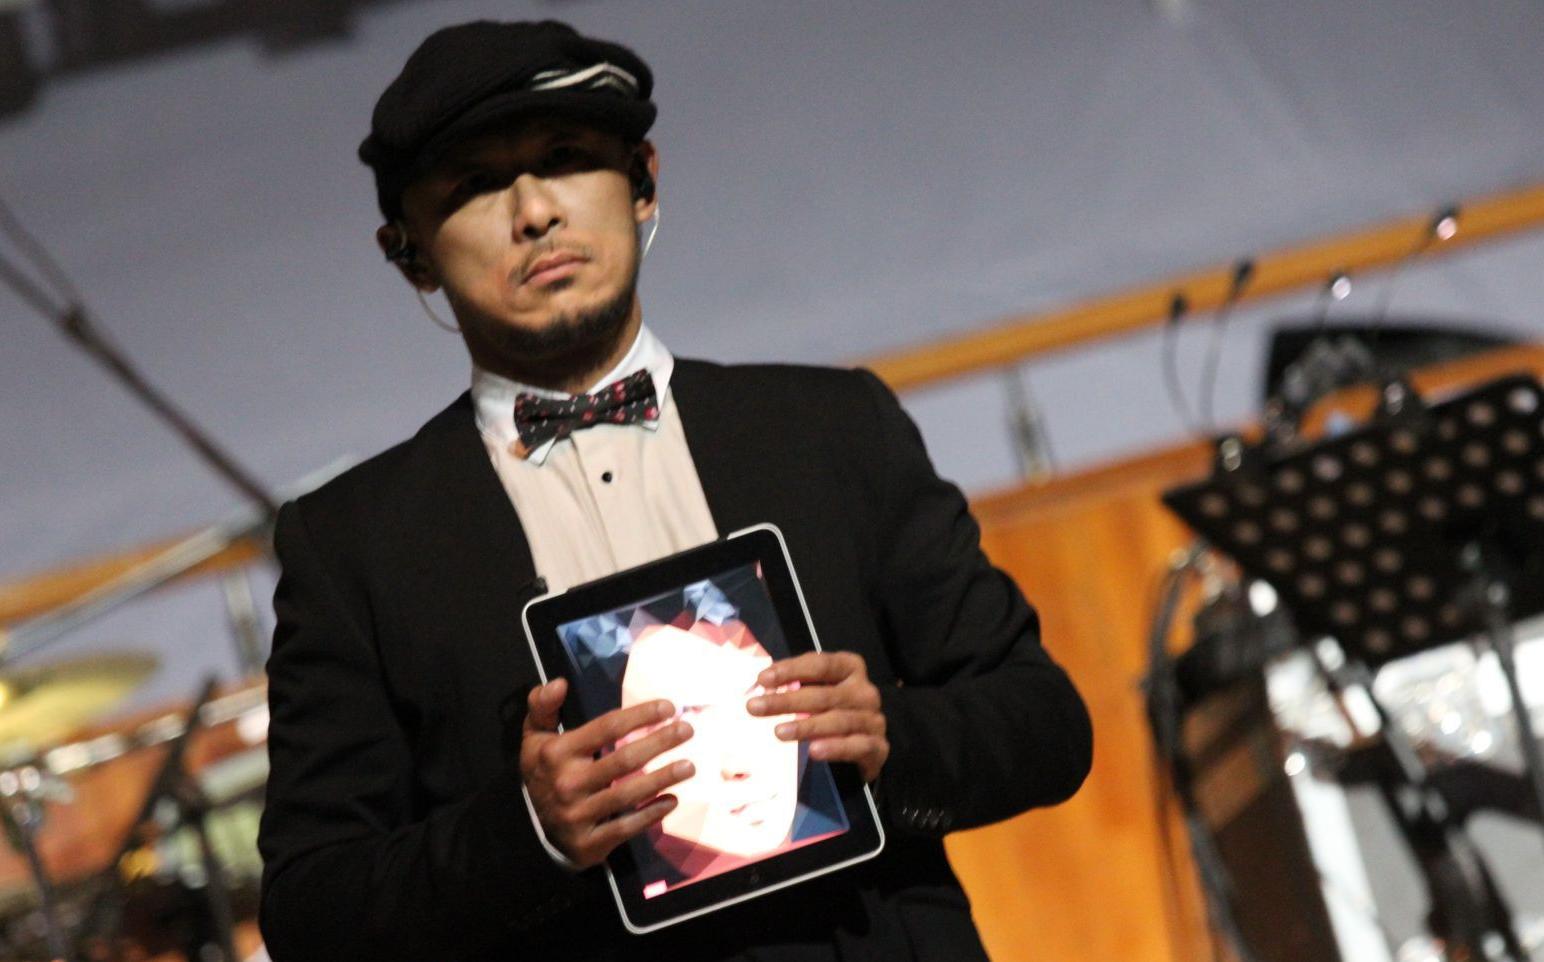 (From 杨小哒 http://www.weibo.com/dada1180706 微博) Jason與人山人海一向以「電子玩具」作樂器而聞名,這個用上黃耀明的大頭照!